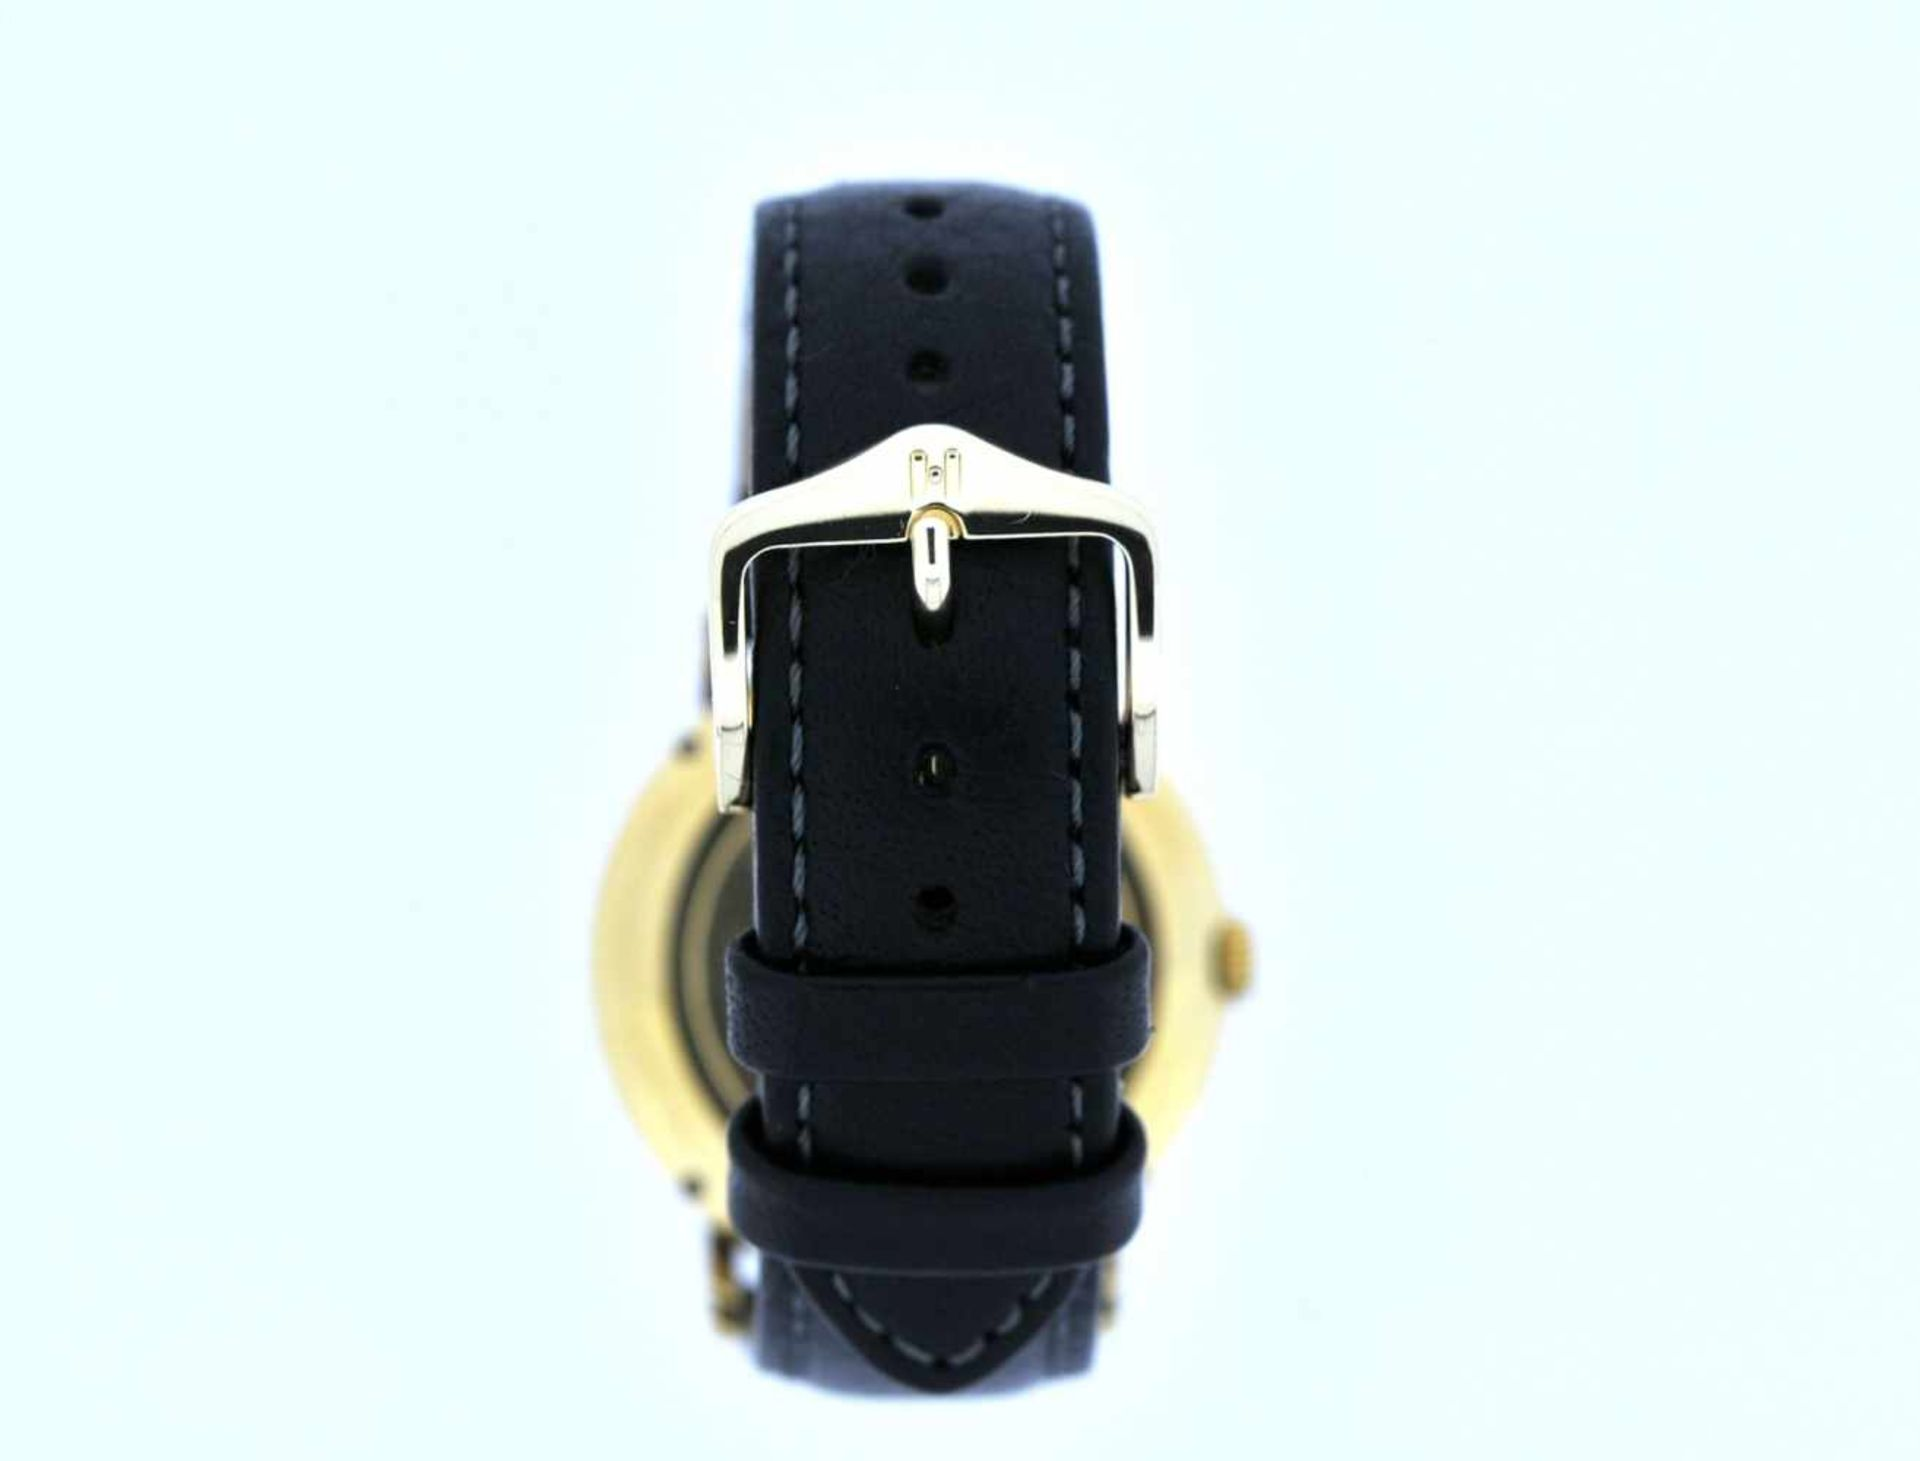 IWC Goldene 18karätige Armbanduhr an Lederband, IWC, Automatik, zentrale Sekunde, Ankerwerk, - Bild 2 aus 4